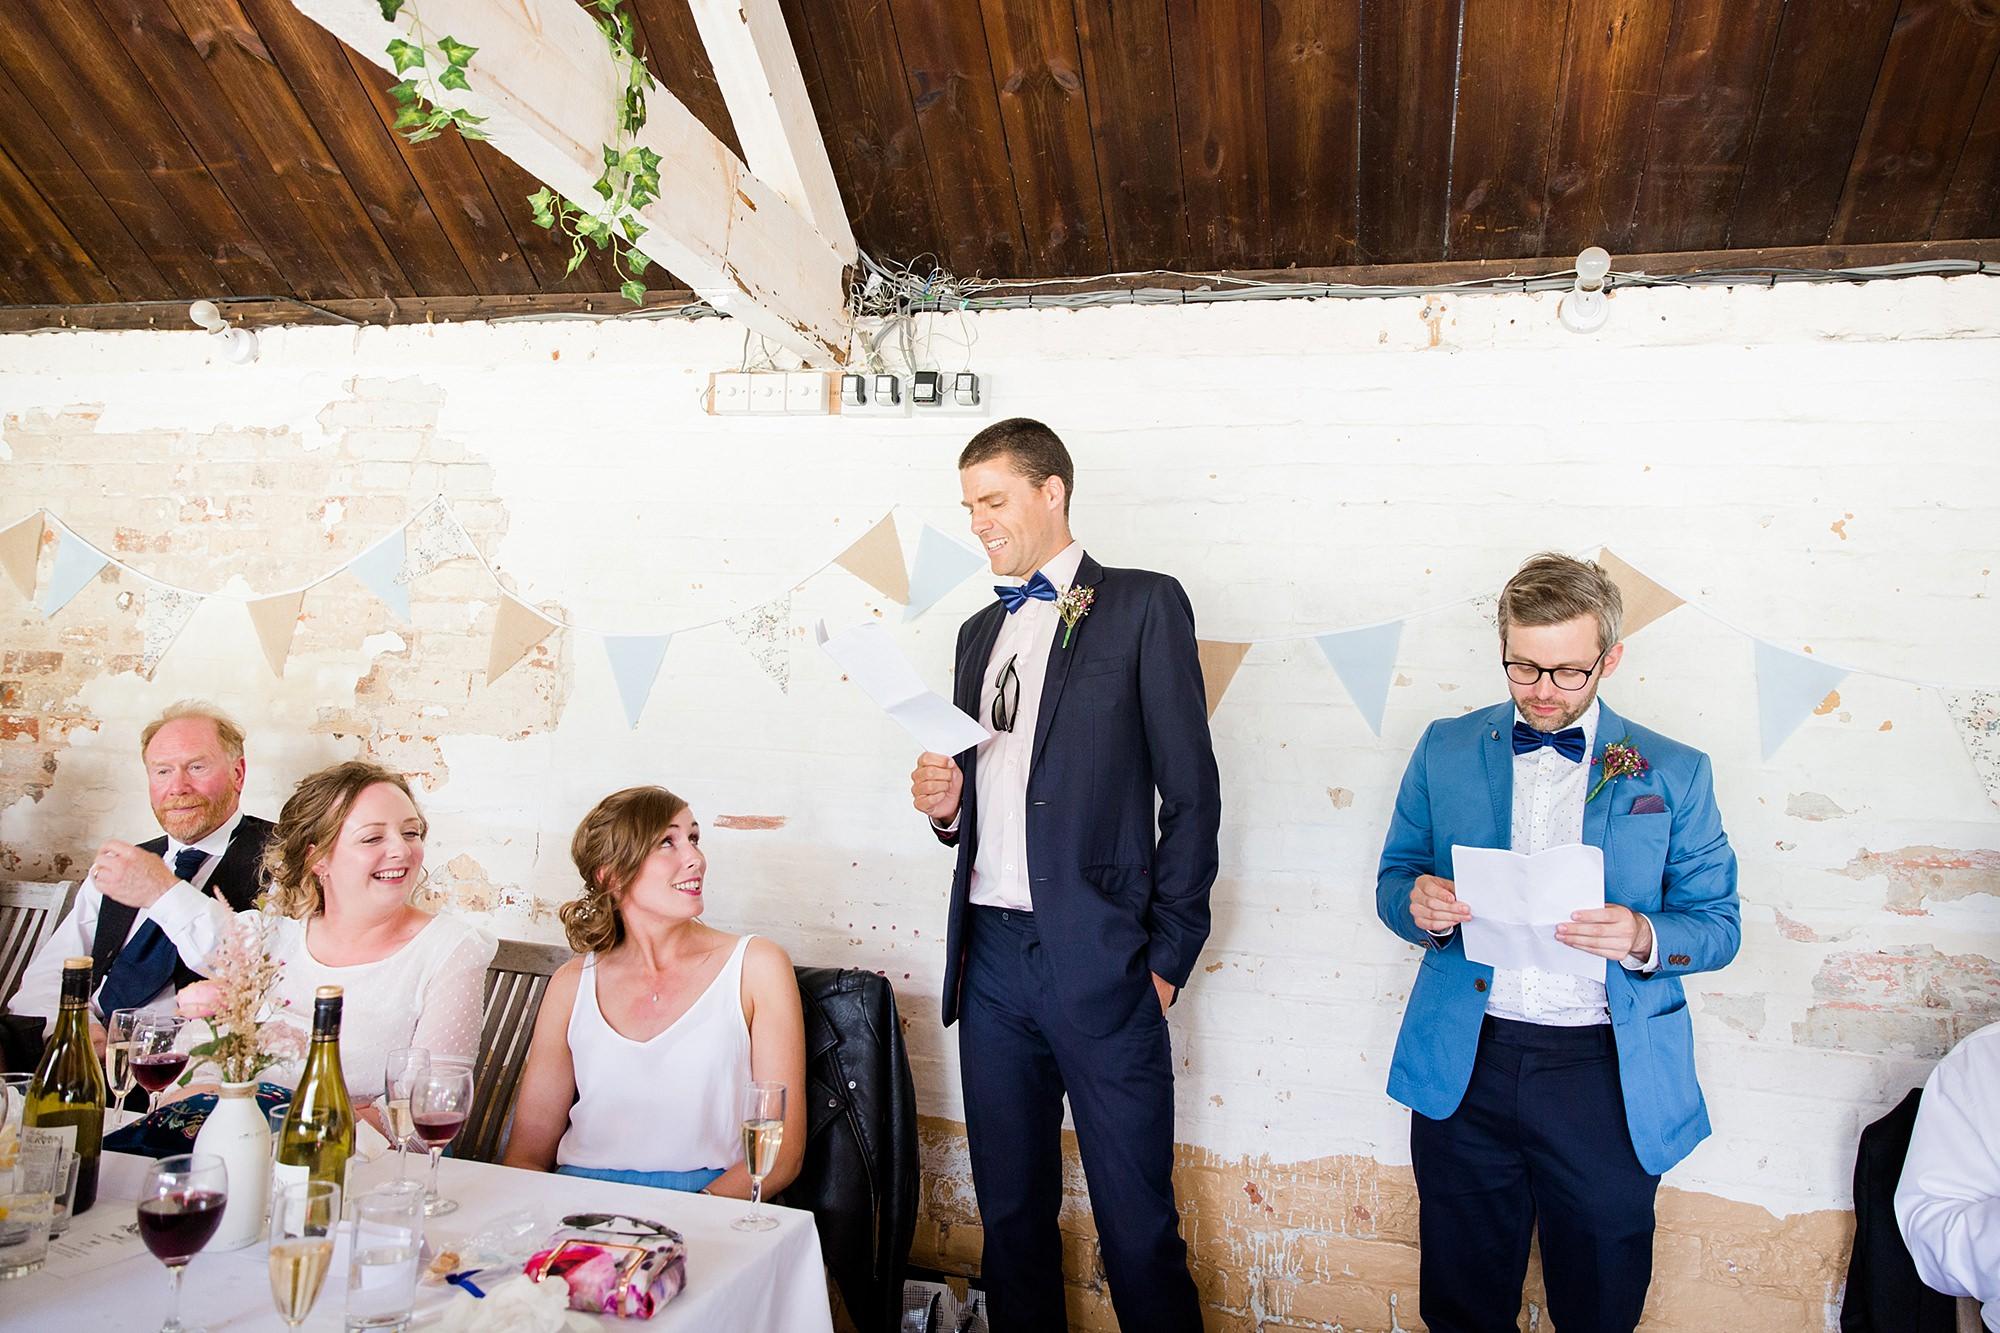 Isis Farmhouse Oxford Wedding best men give a speech